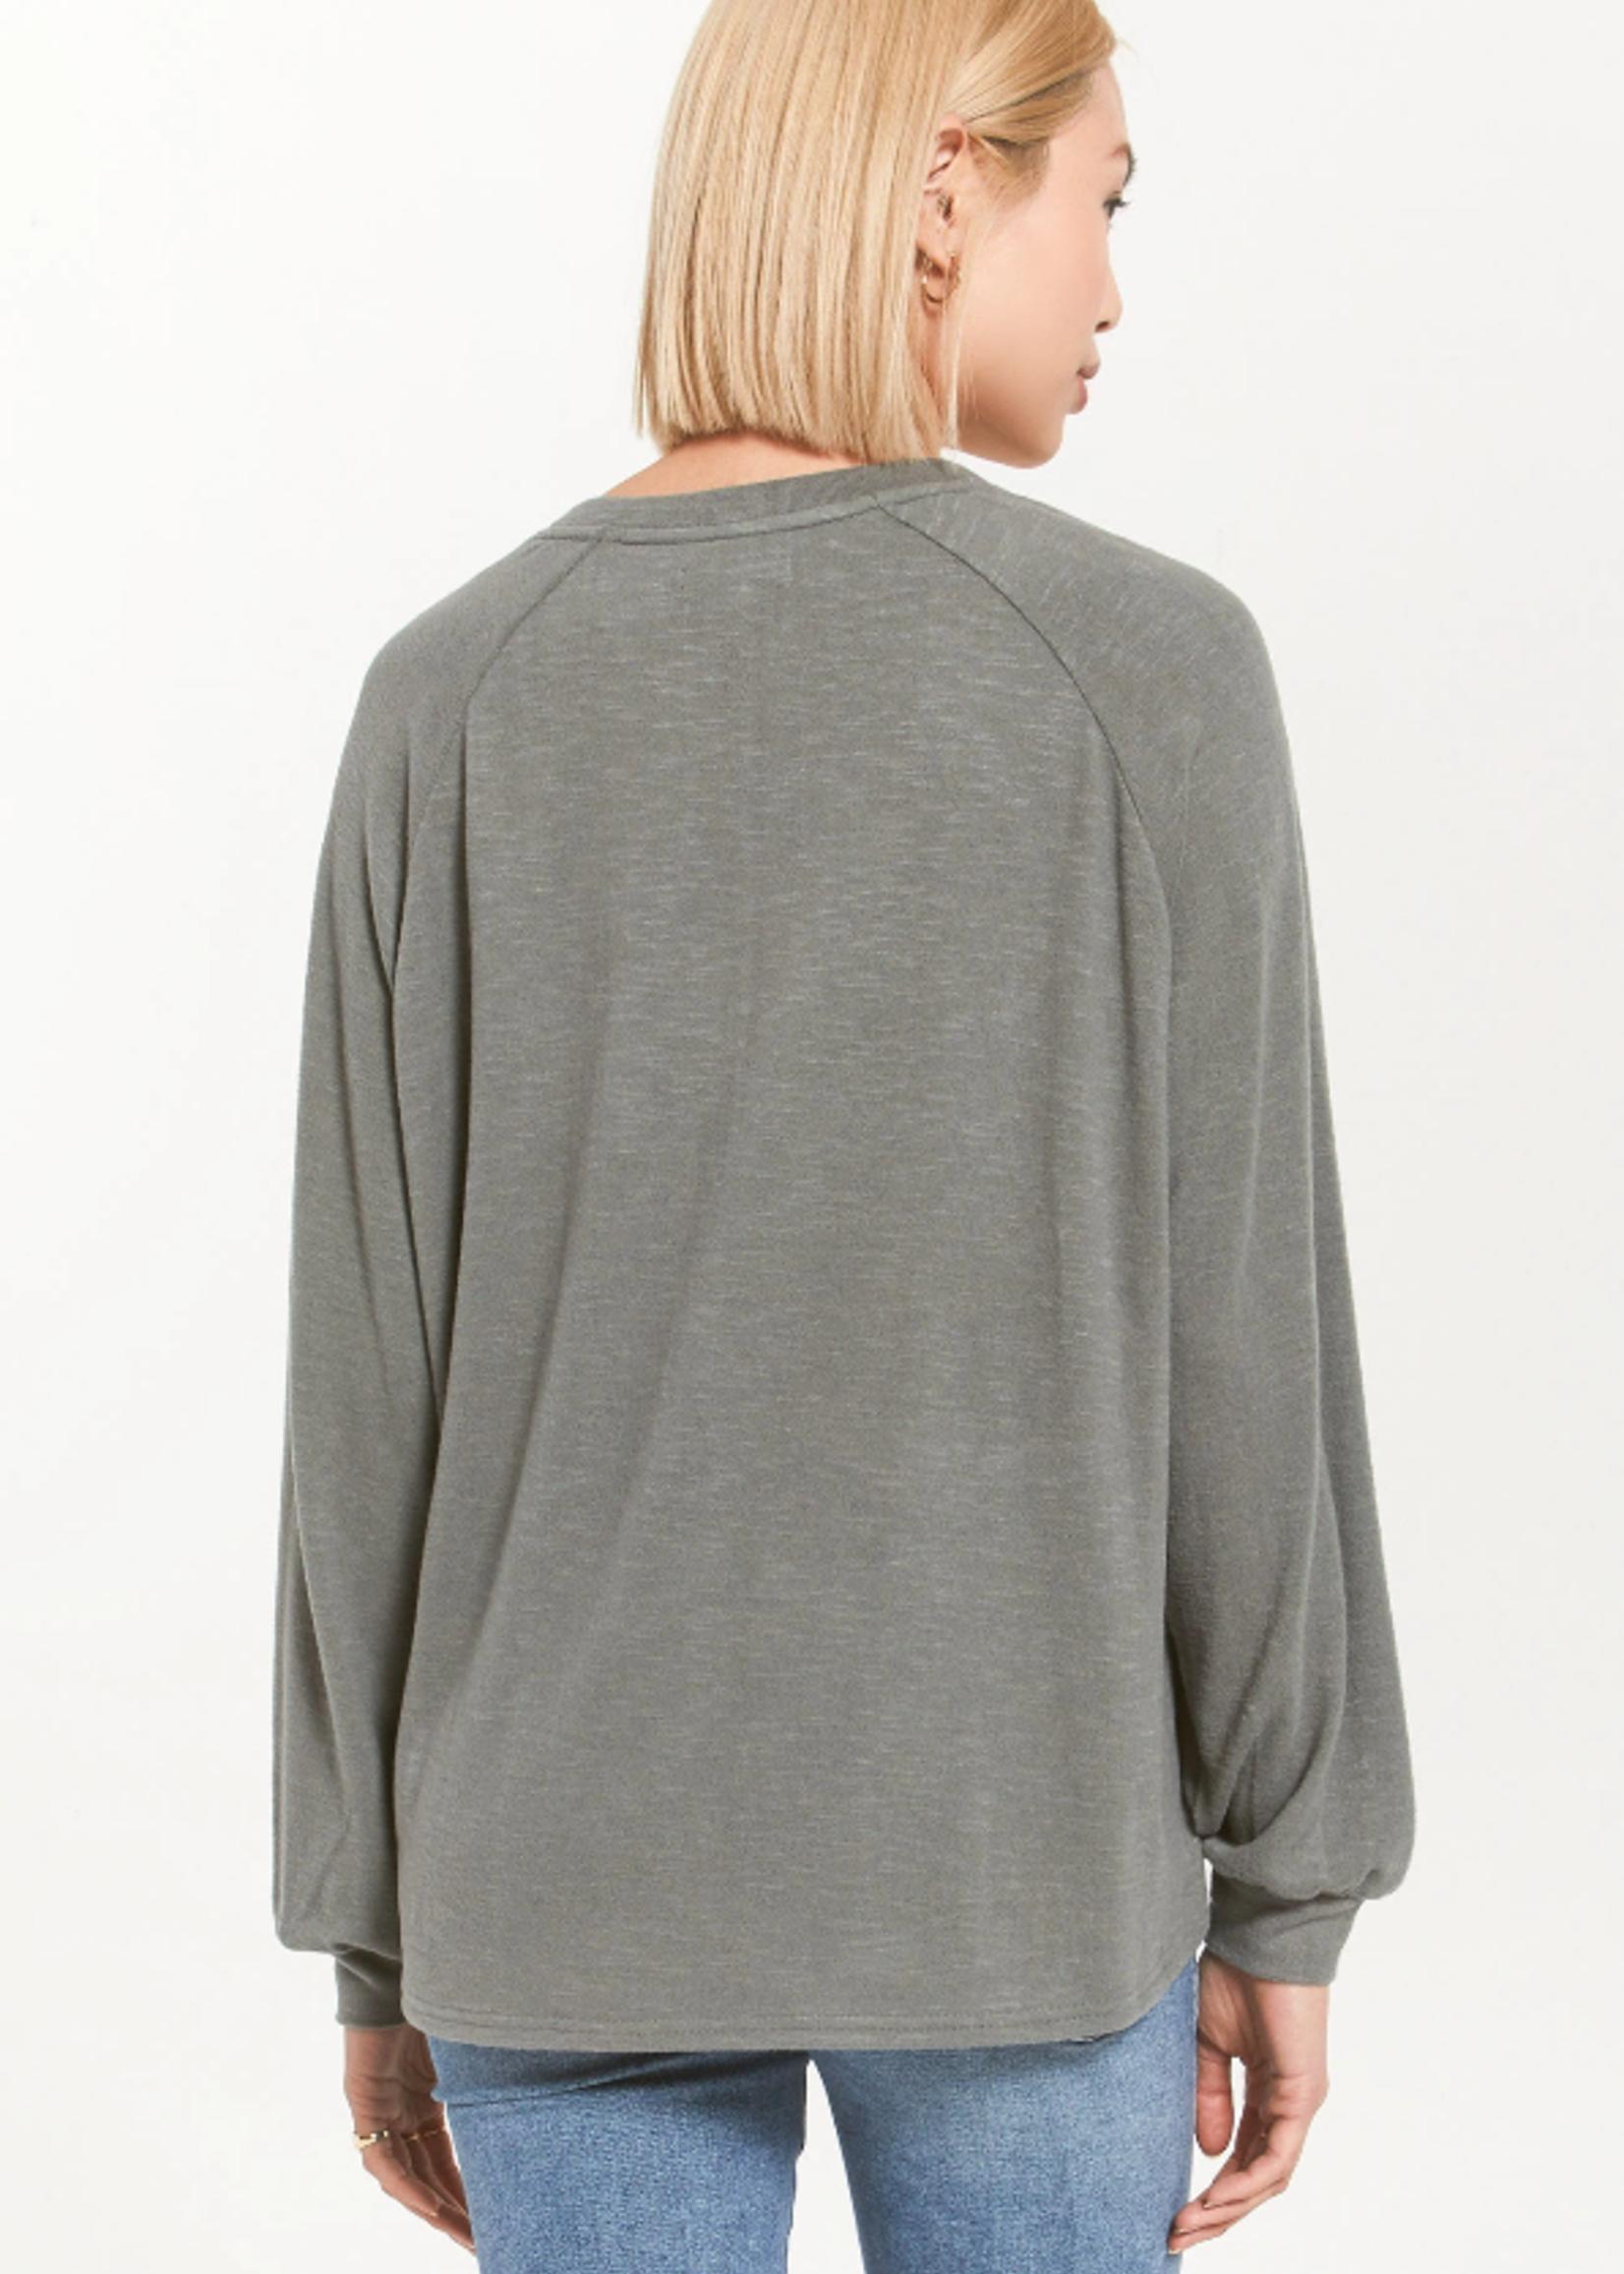 Z Supply Plira Slub Sweater - Ash Green